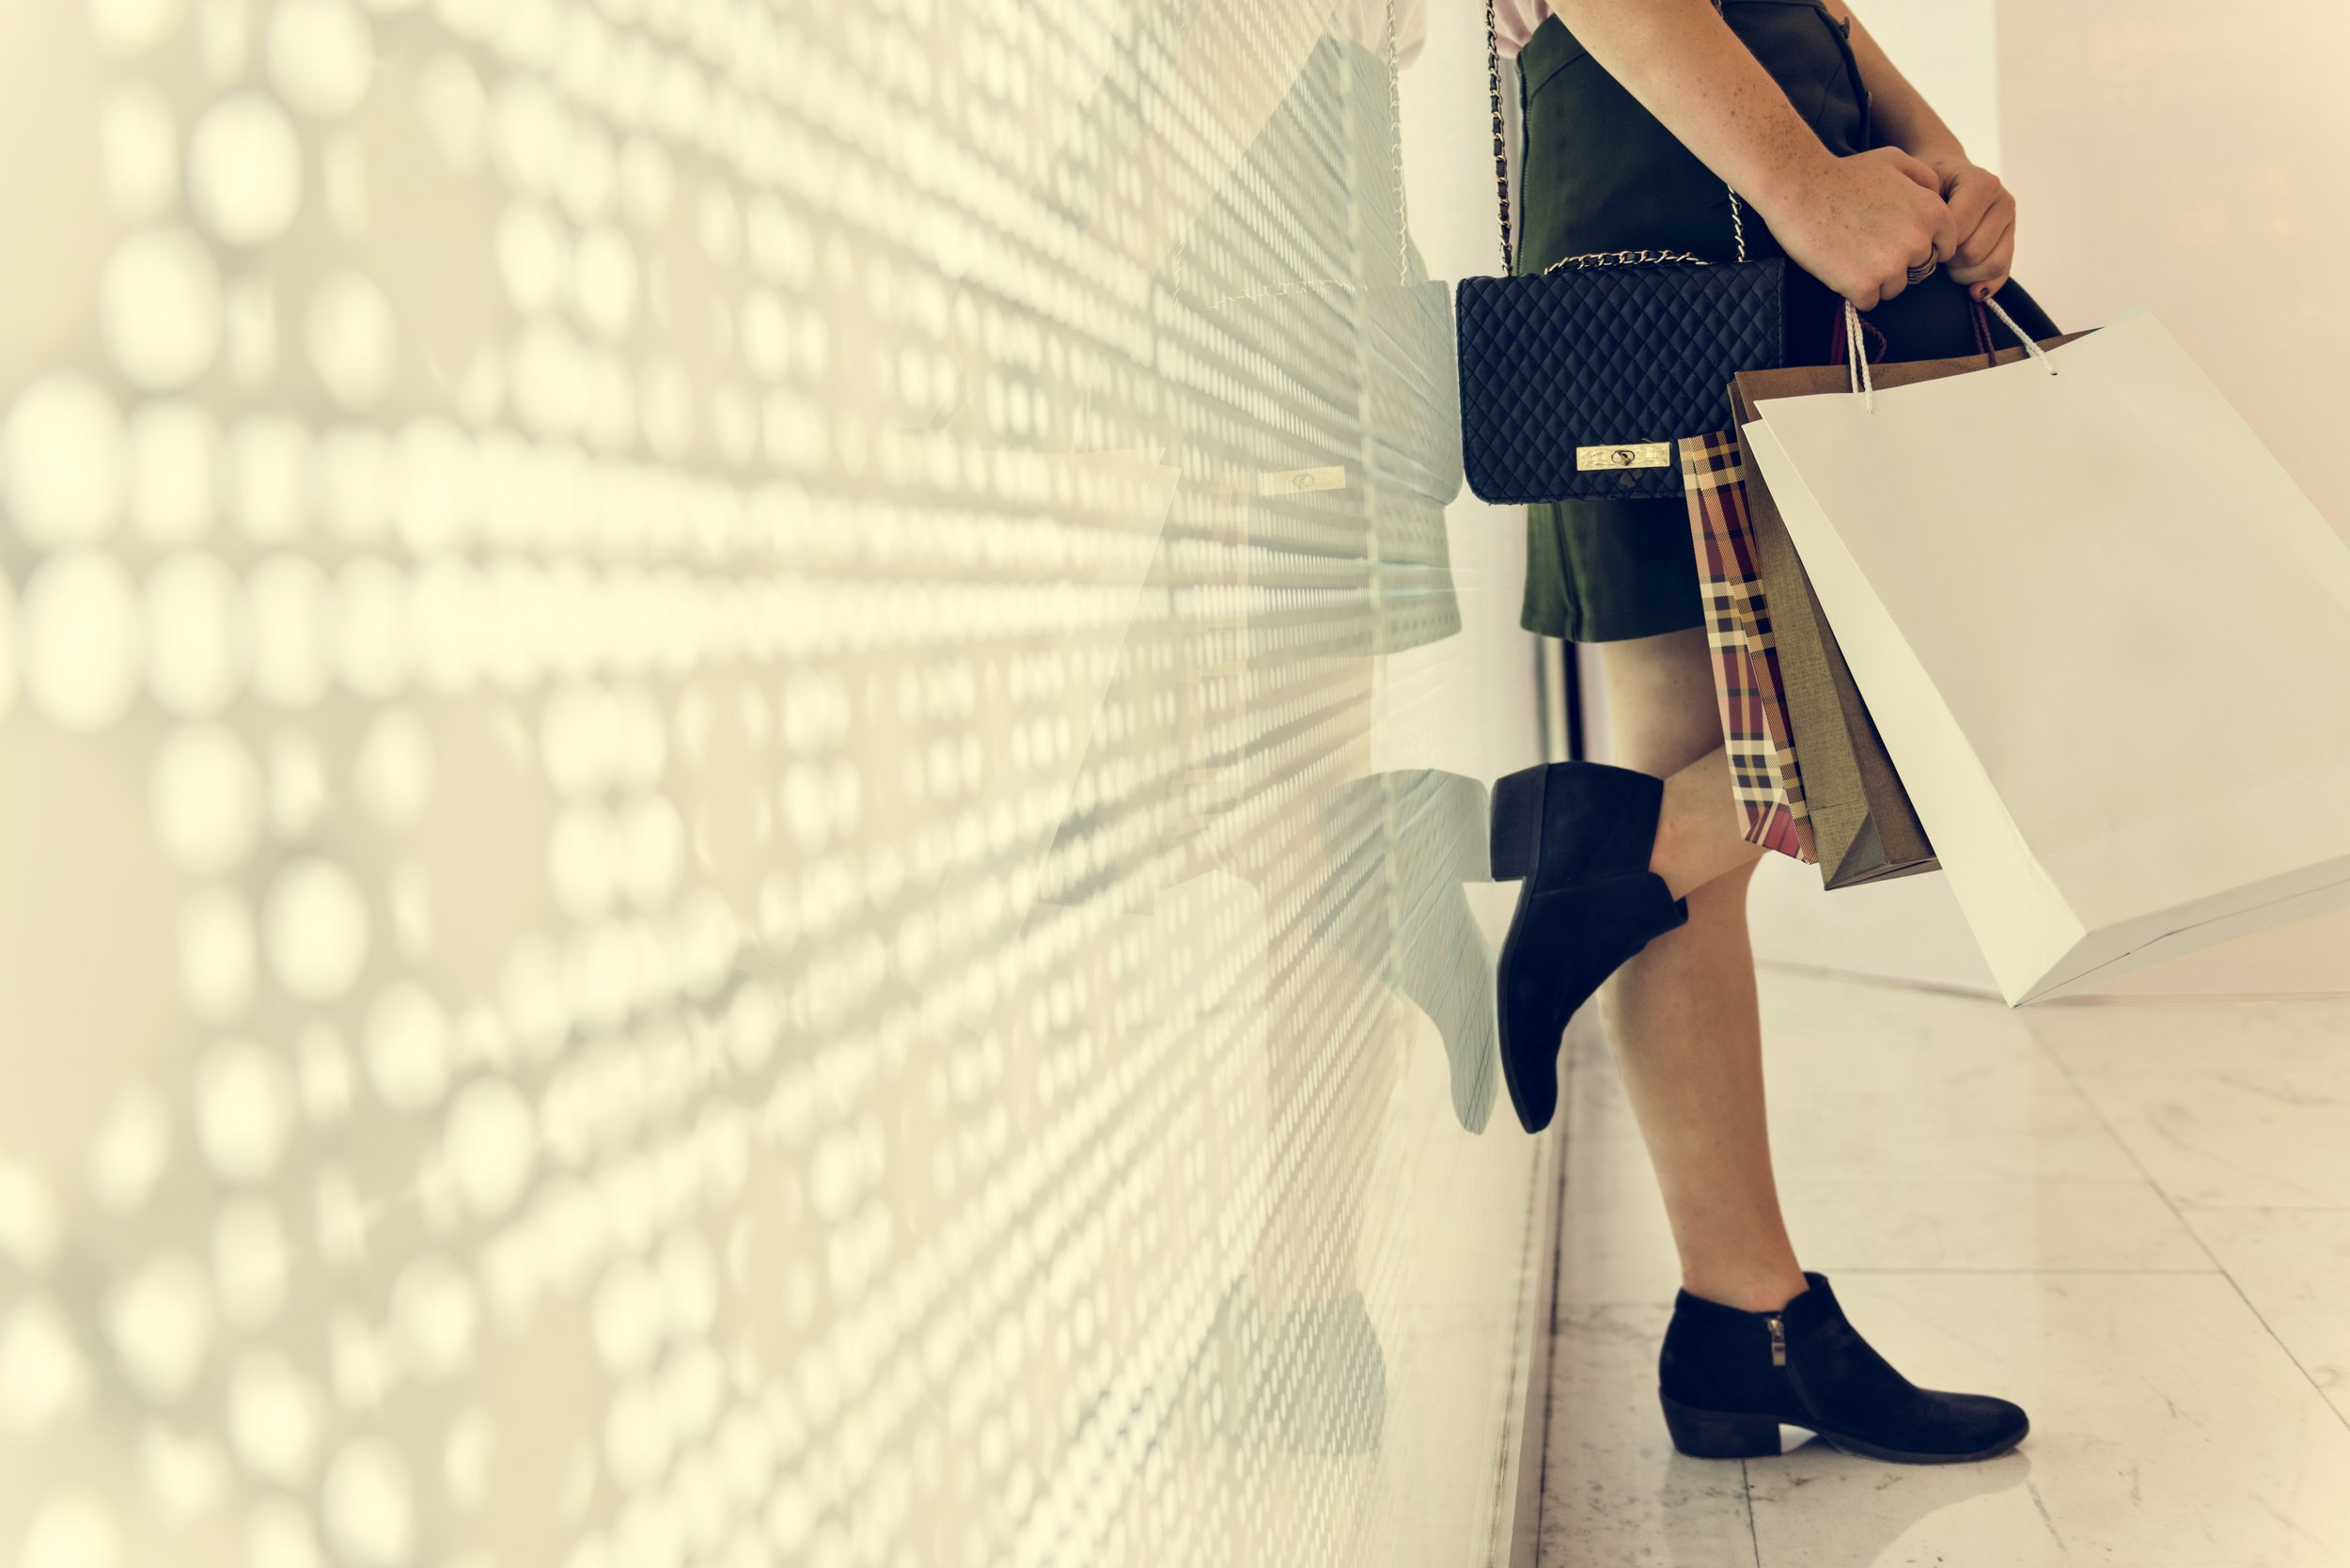 young-woman-shopping-consumer-concept-PKV9YGF.jpg